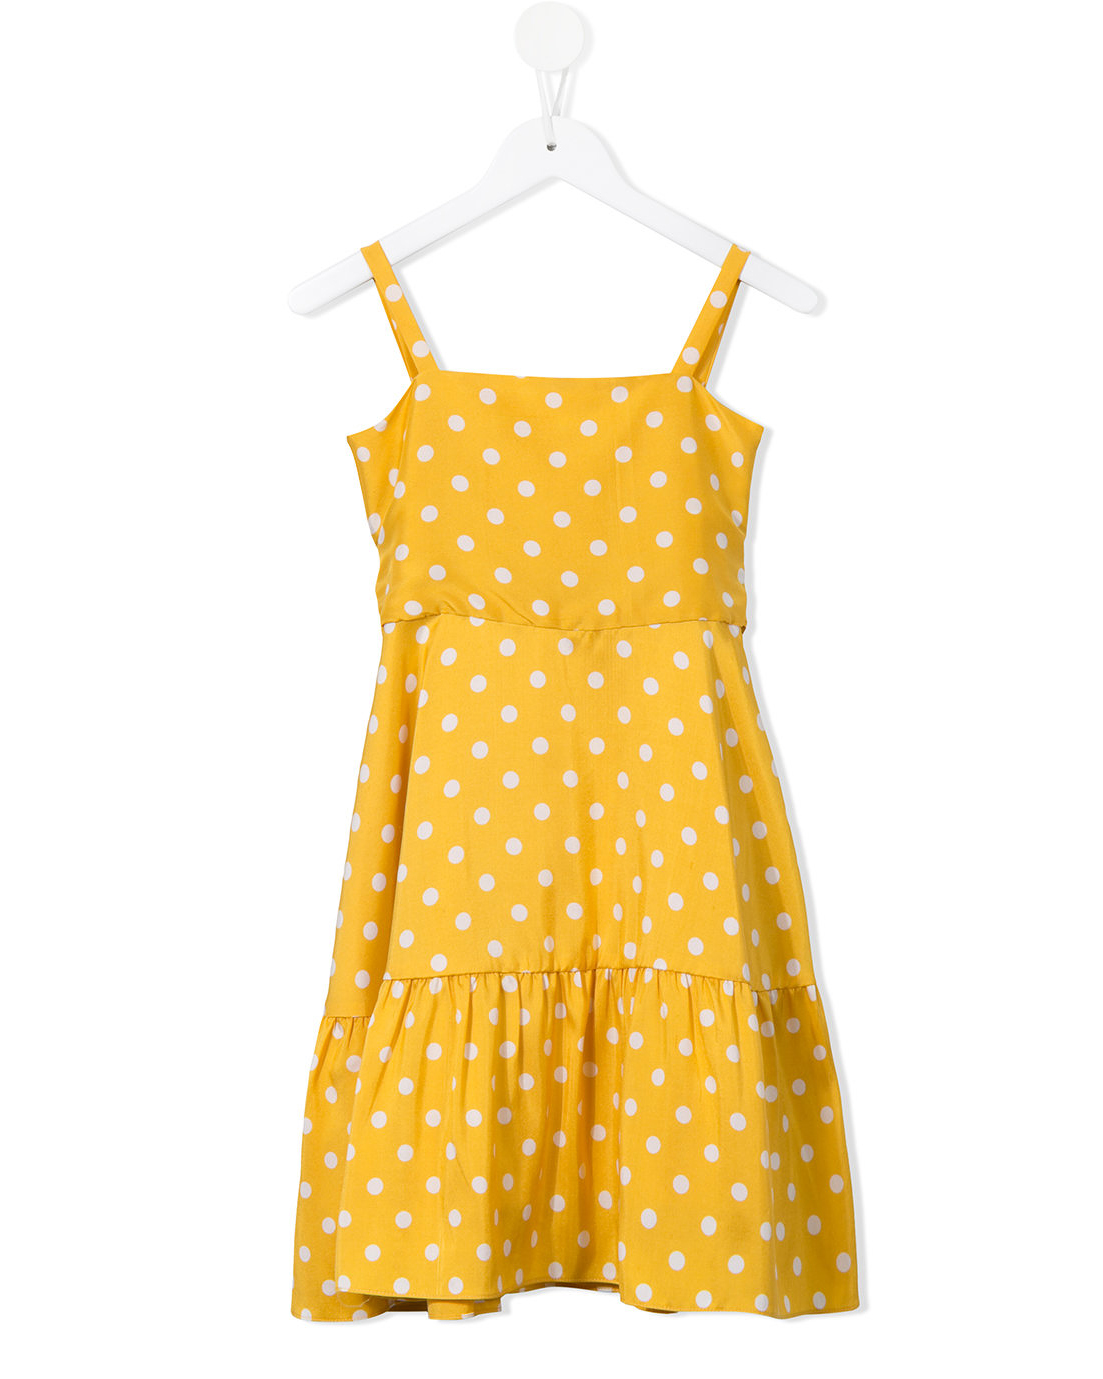 yellow polka-dot dress